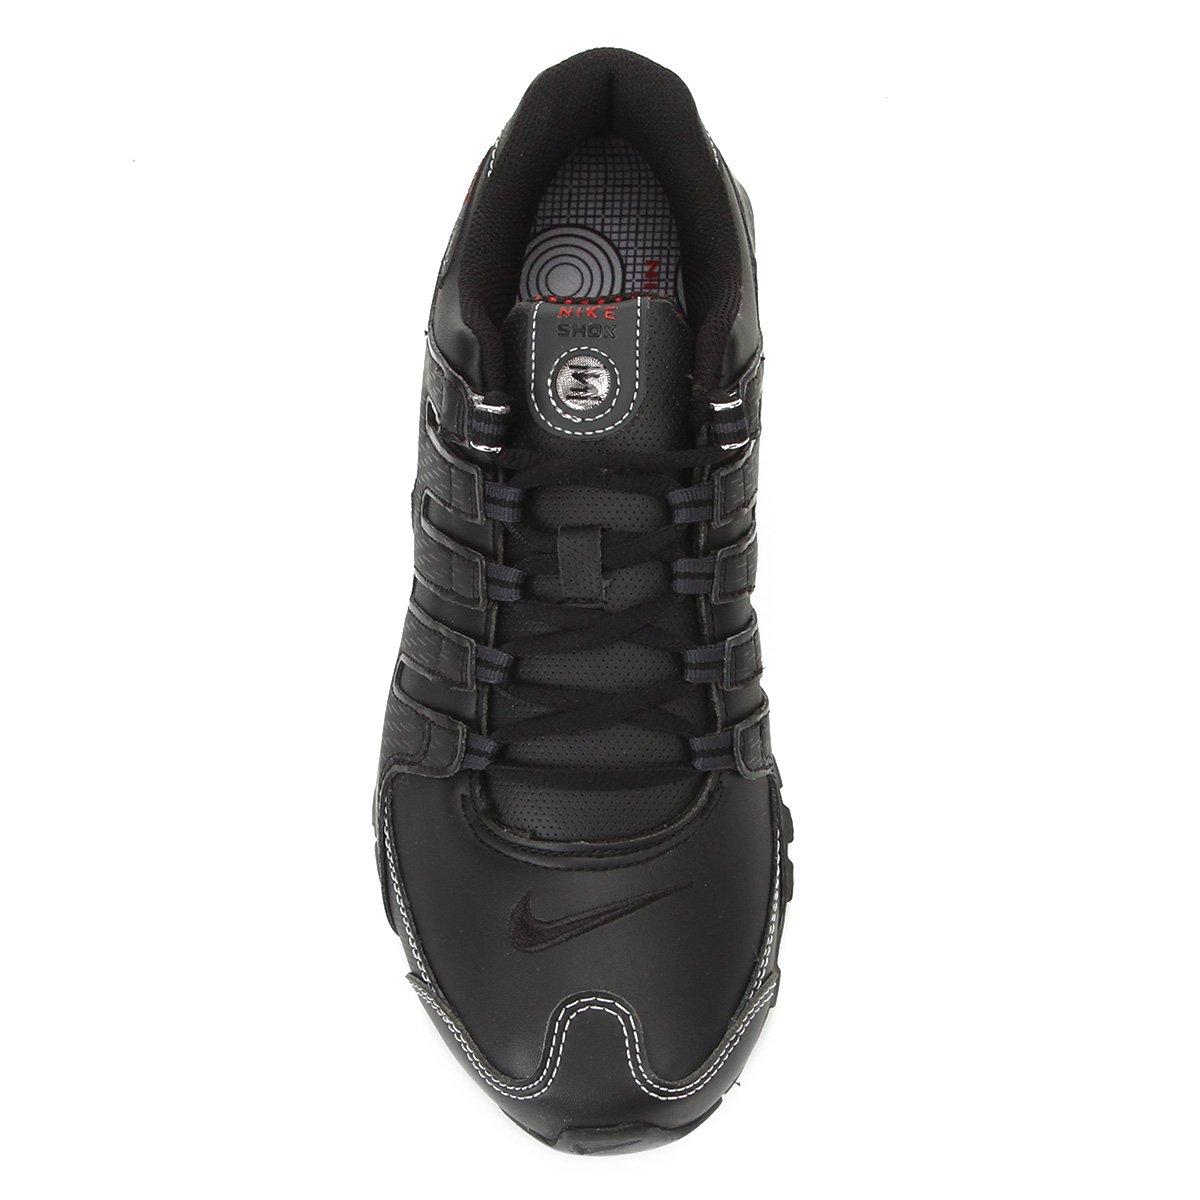 Tênis Nike Shox Nz Masculino - Tam: 42 - 2